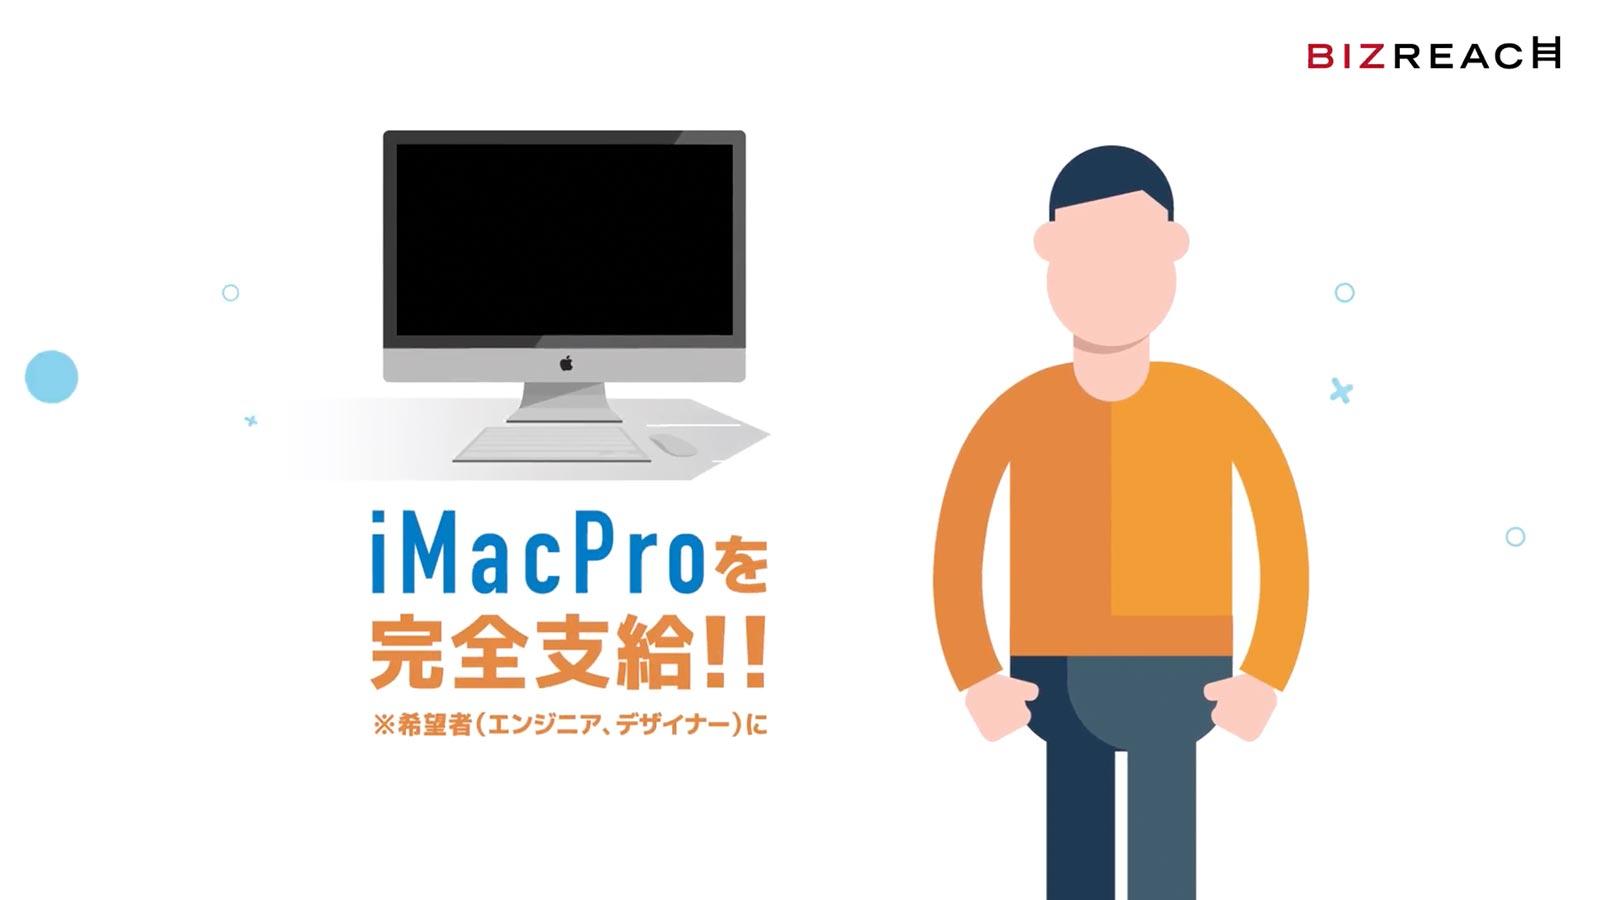 iMacProを完全支給